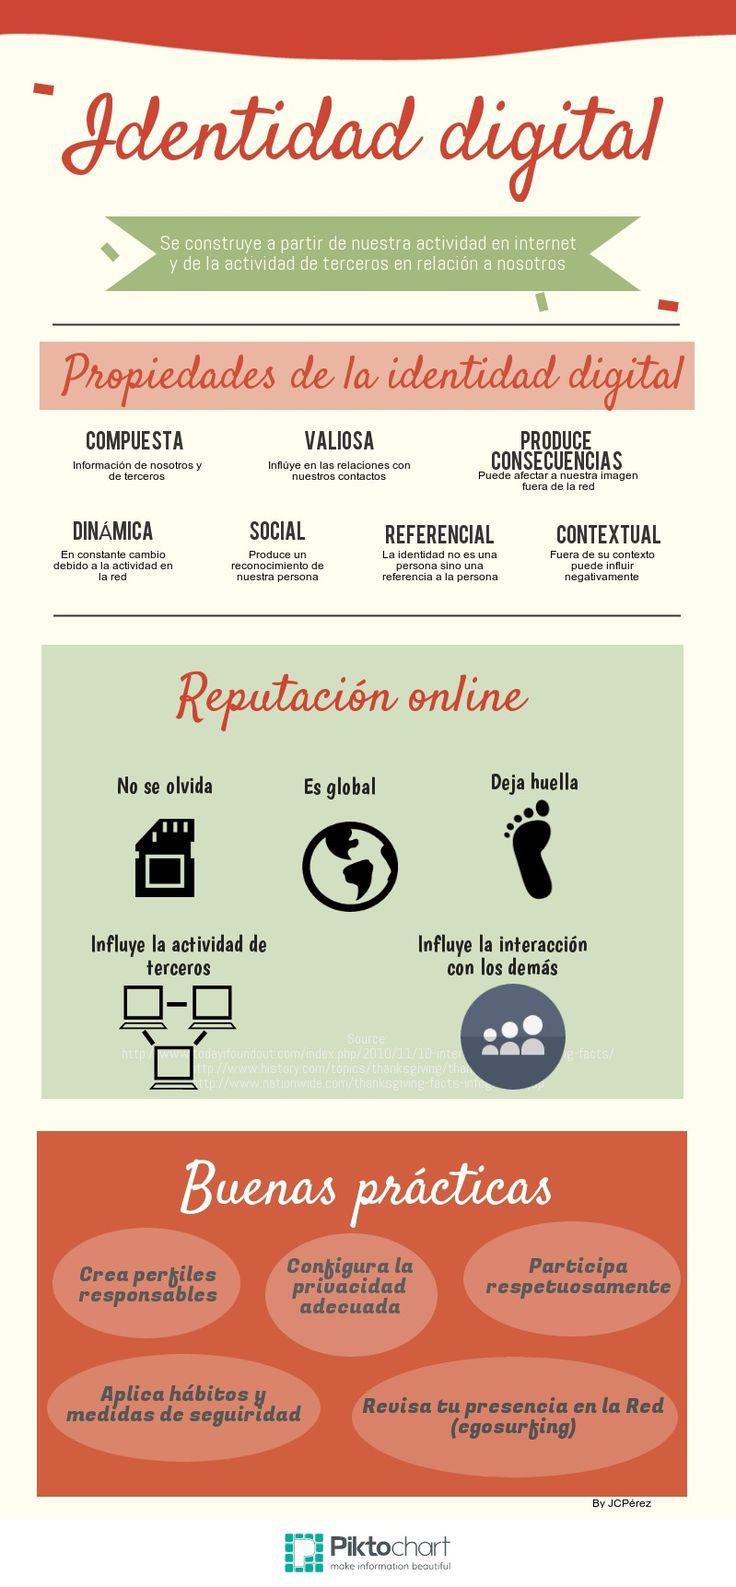 La identidad digital